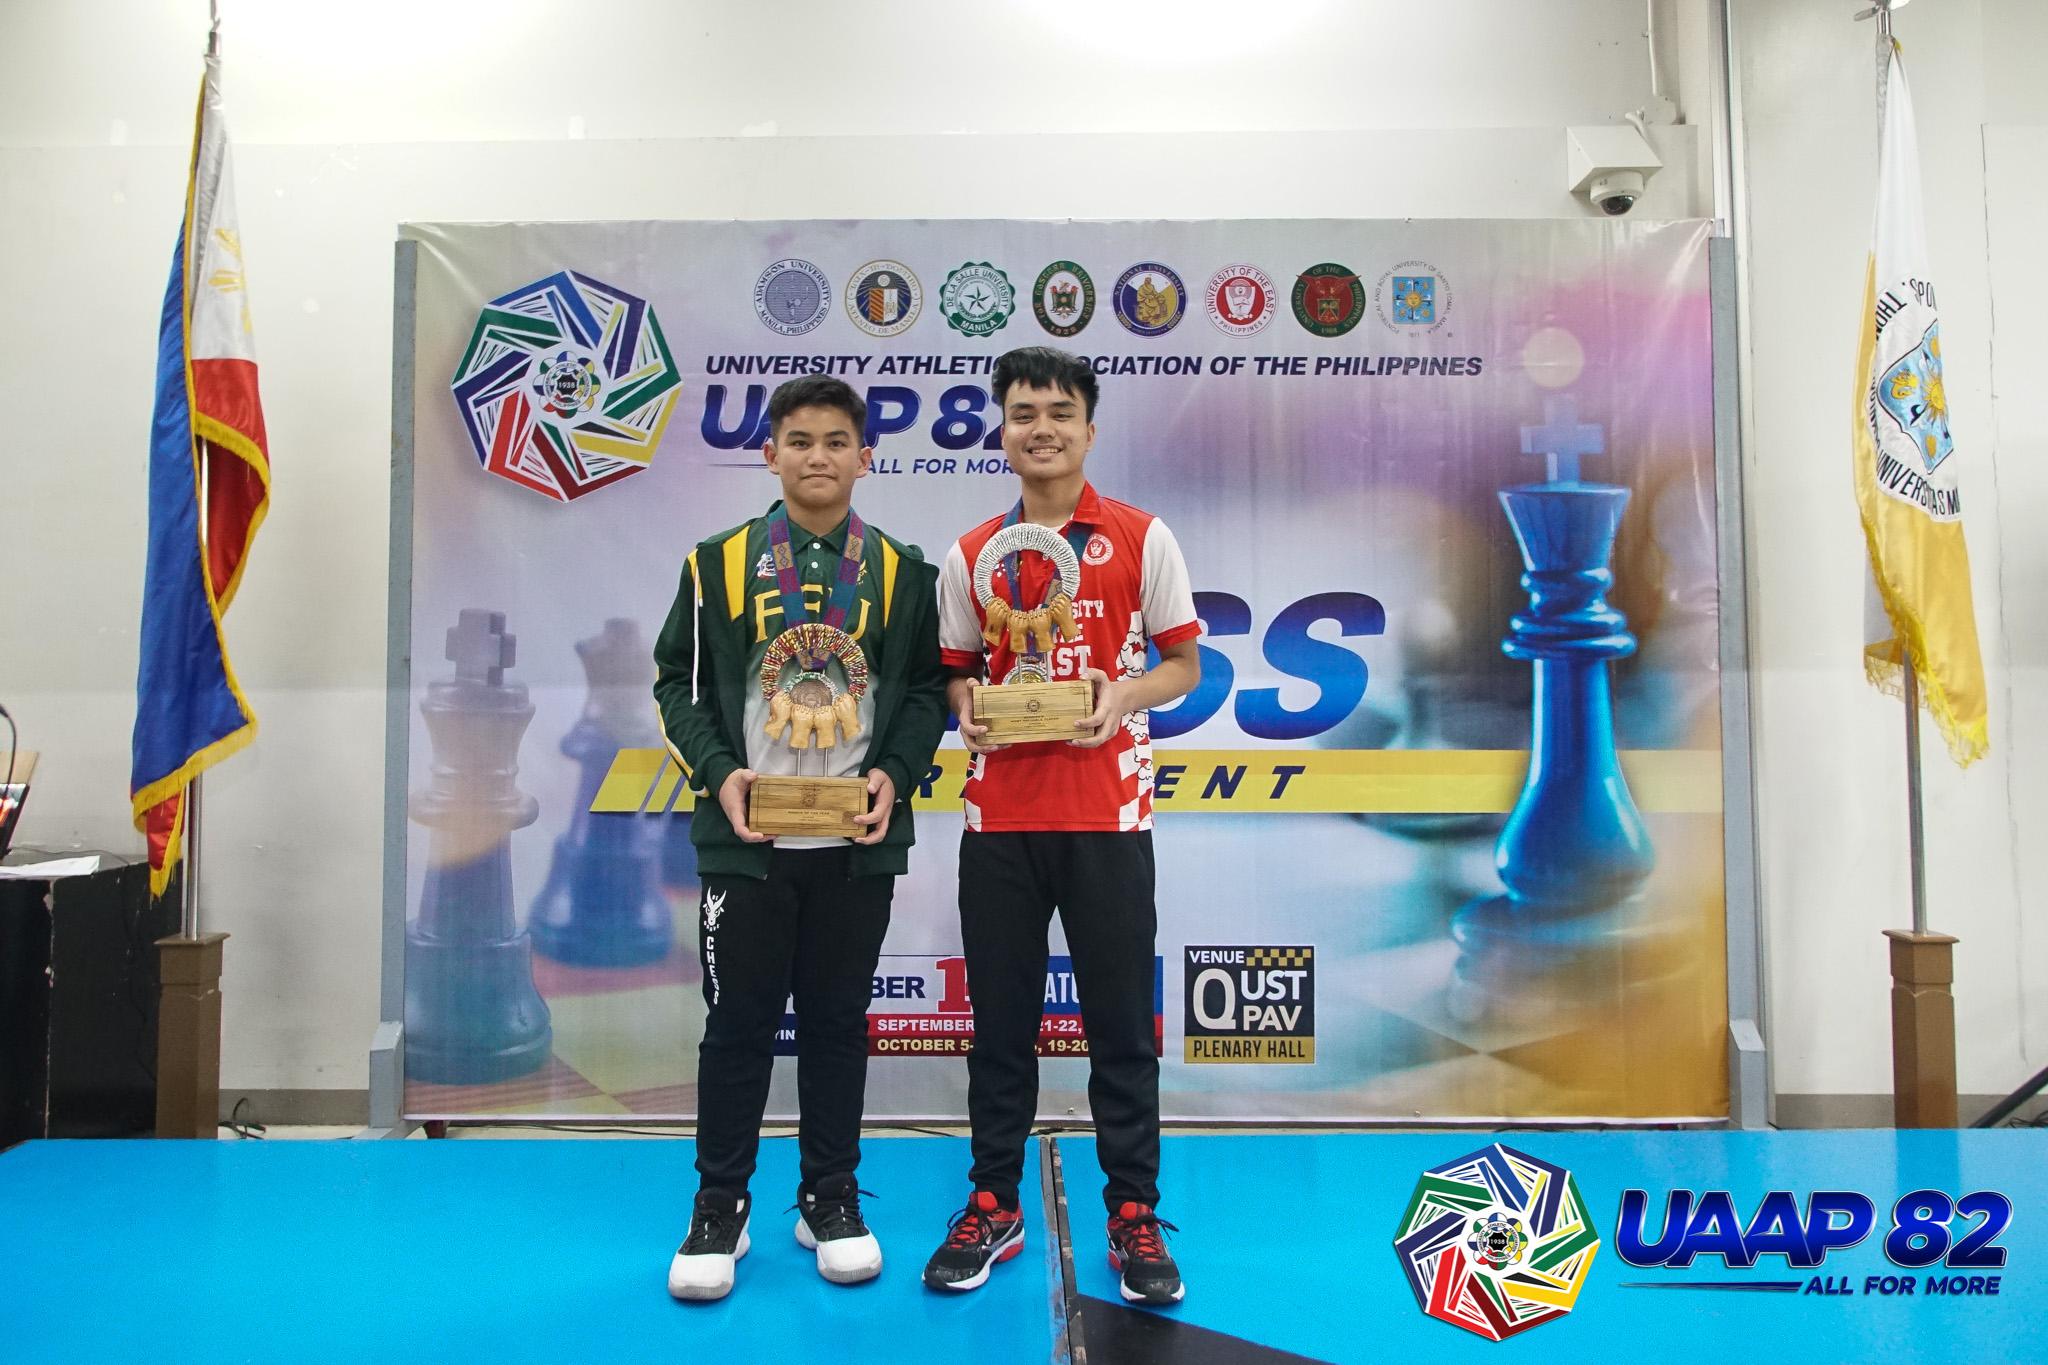 UAAP-82-Boys-Chess-Awarding-5-MVP-Lee-Roi-Palma-and-ROY-Alekhine-Nouri NU overtakes FEU to take UAAP Girls' Chess crown, UE Boys' ends 13-year drought ADMU AdU Chess DLSU FEU News NU UAAP UE UST  - philippine sports news